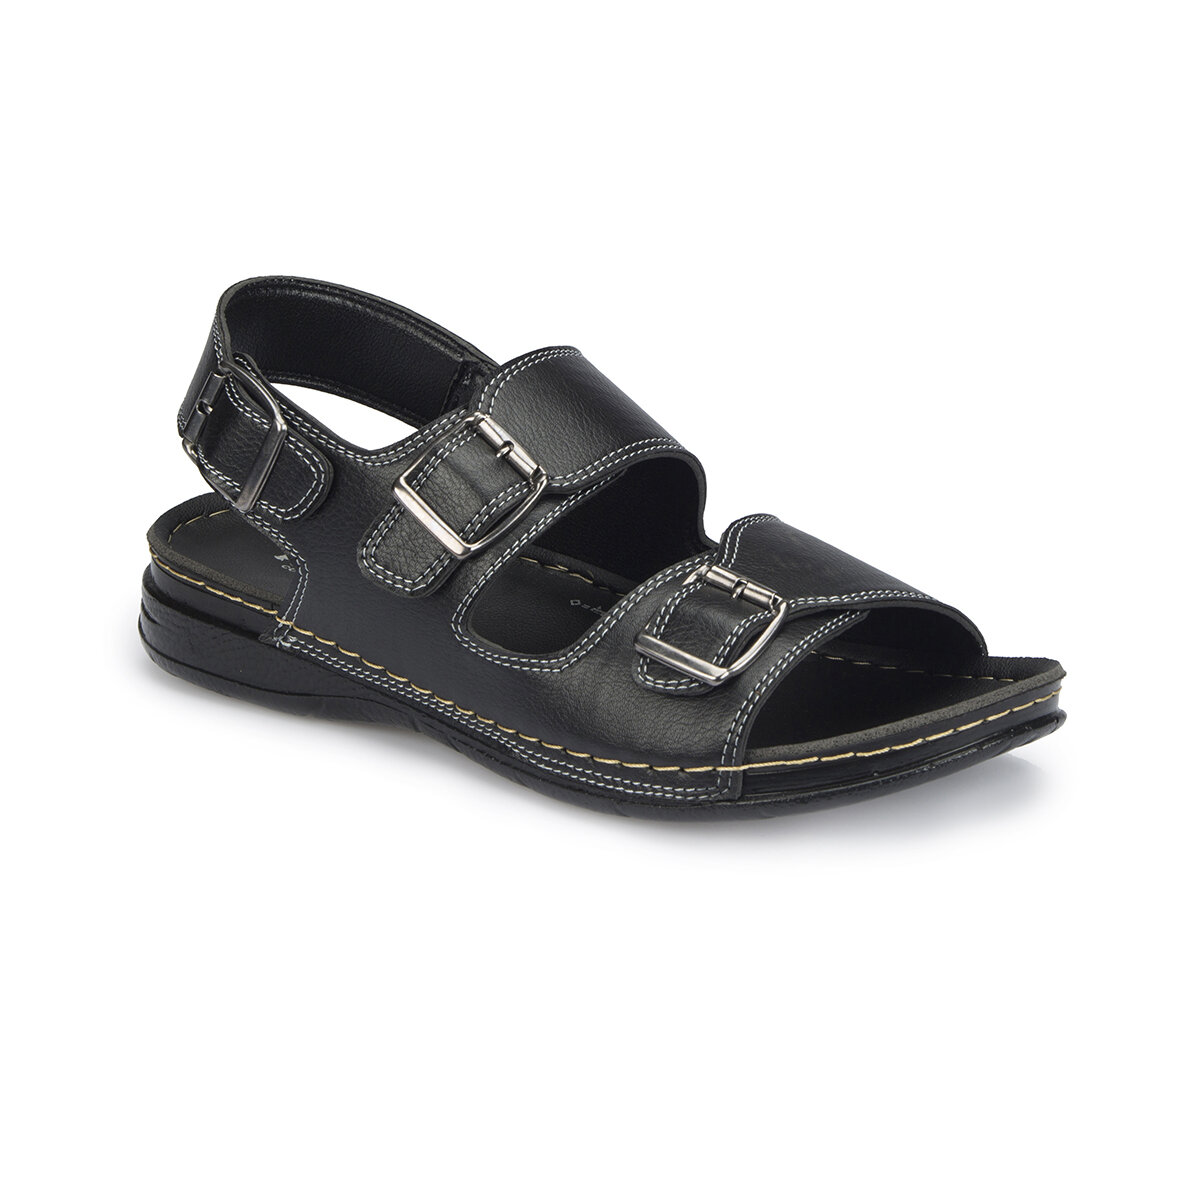 FLO 81.159035.M Black Men 'S Classic Shoes Polaris